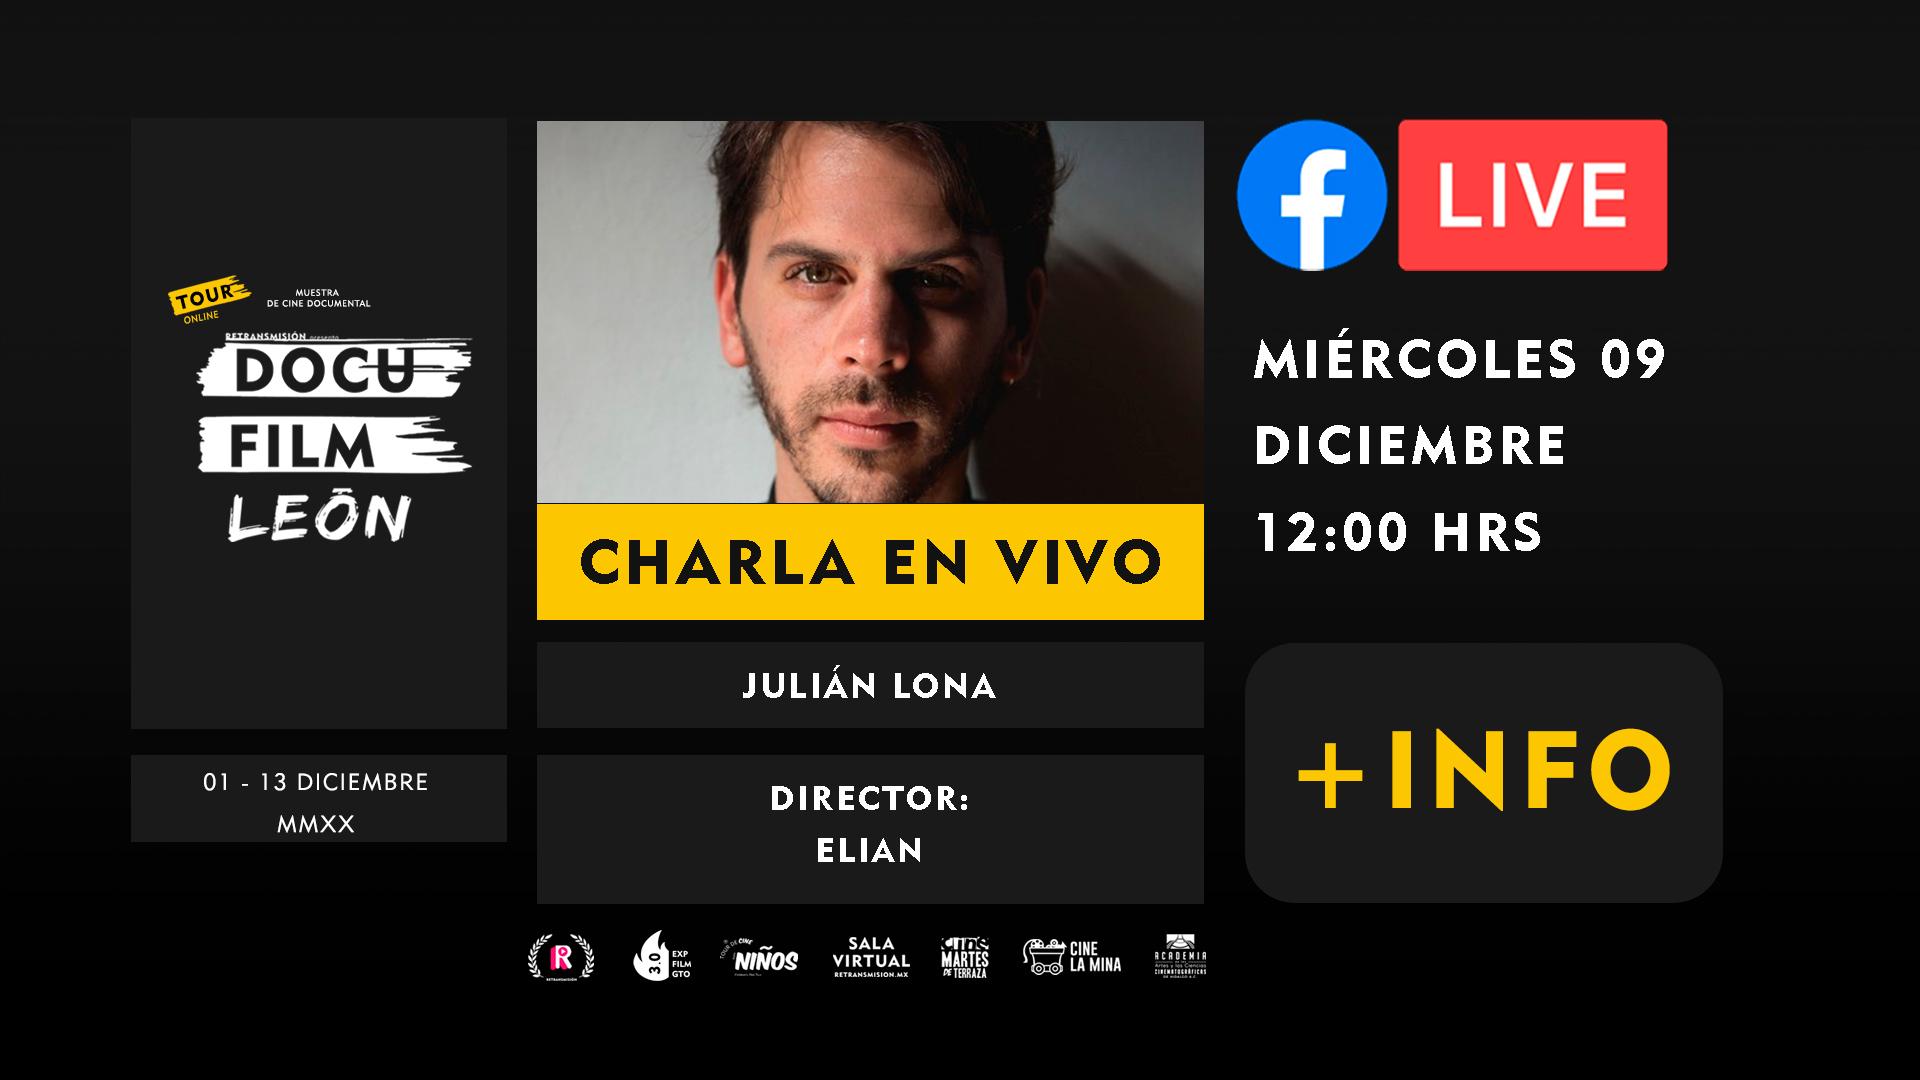 DIRECTORES-charlas+-JULIAN-LONA-DOCU-FILM-LEON-HORIZONTAL